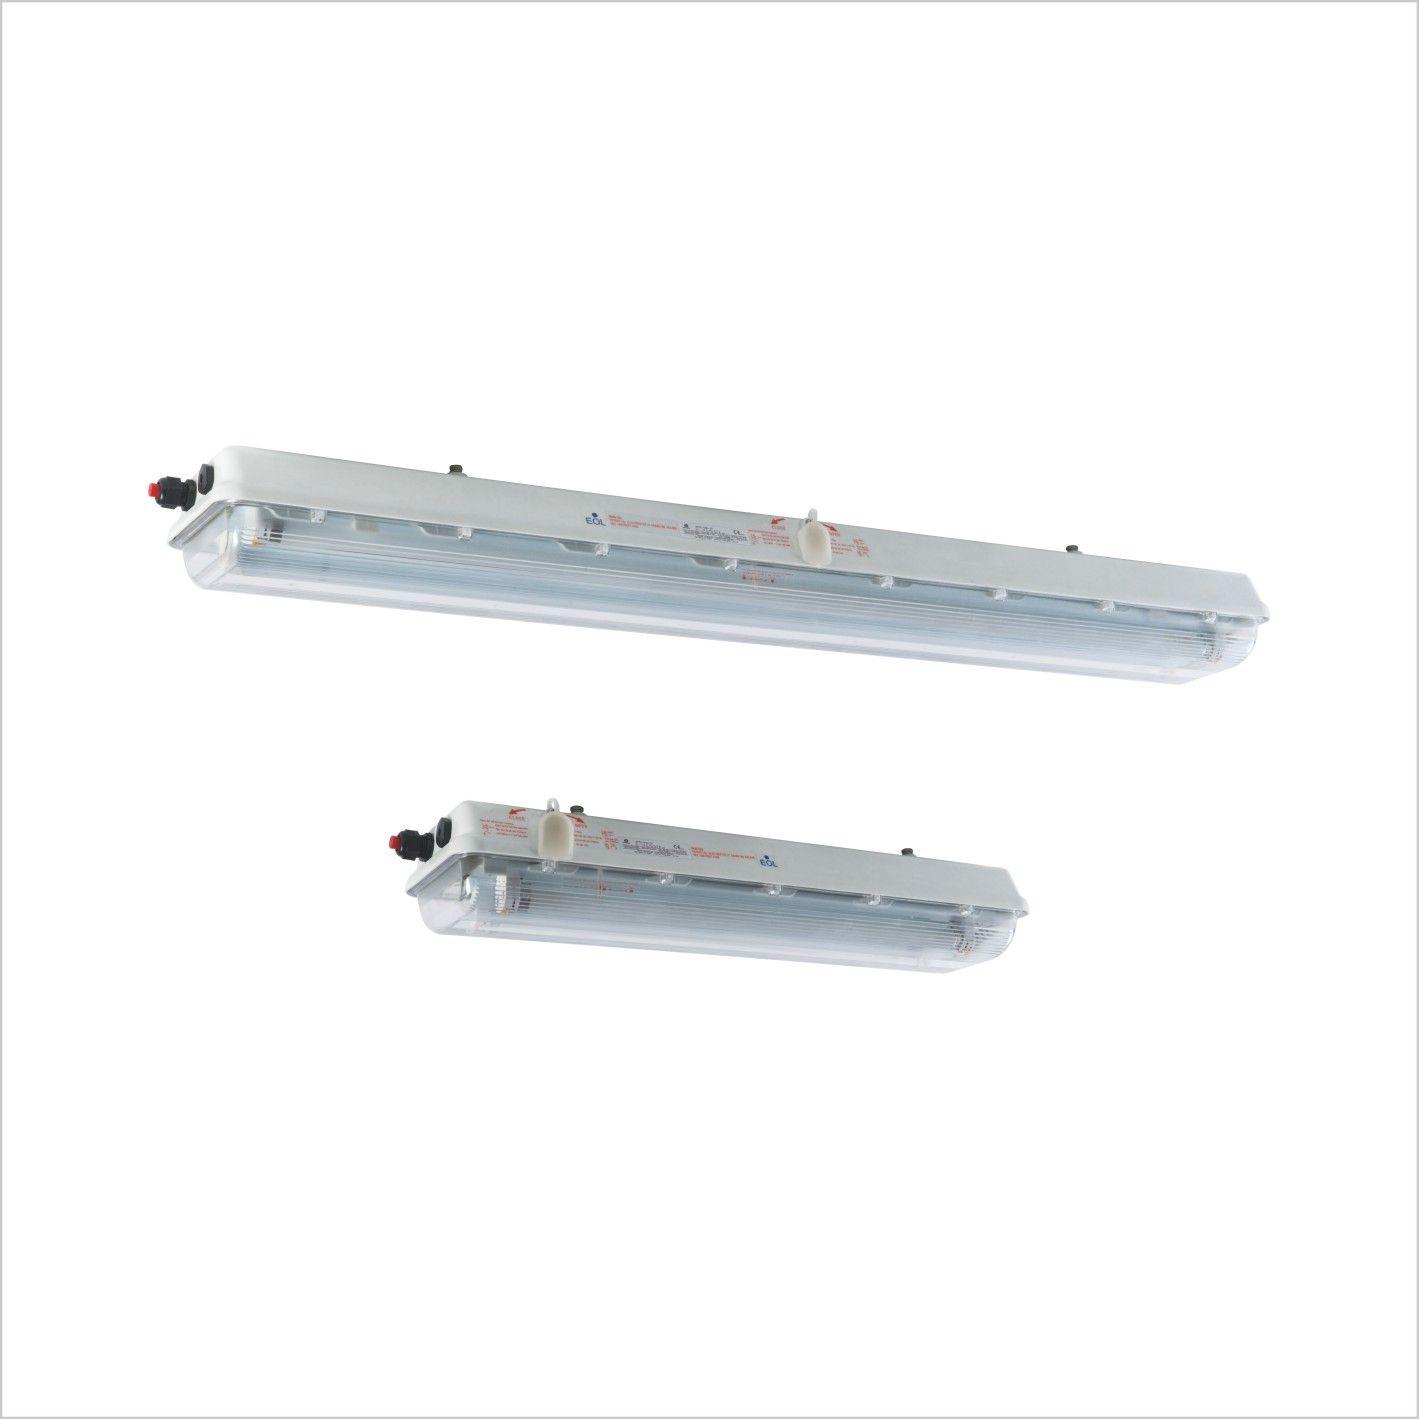 BAY51-Q Series Exproof Fluorescent Lighting Fixture Warom